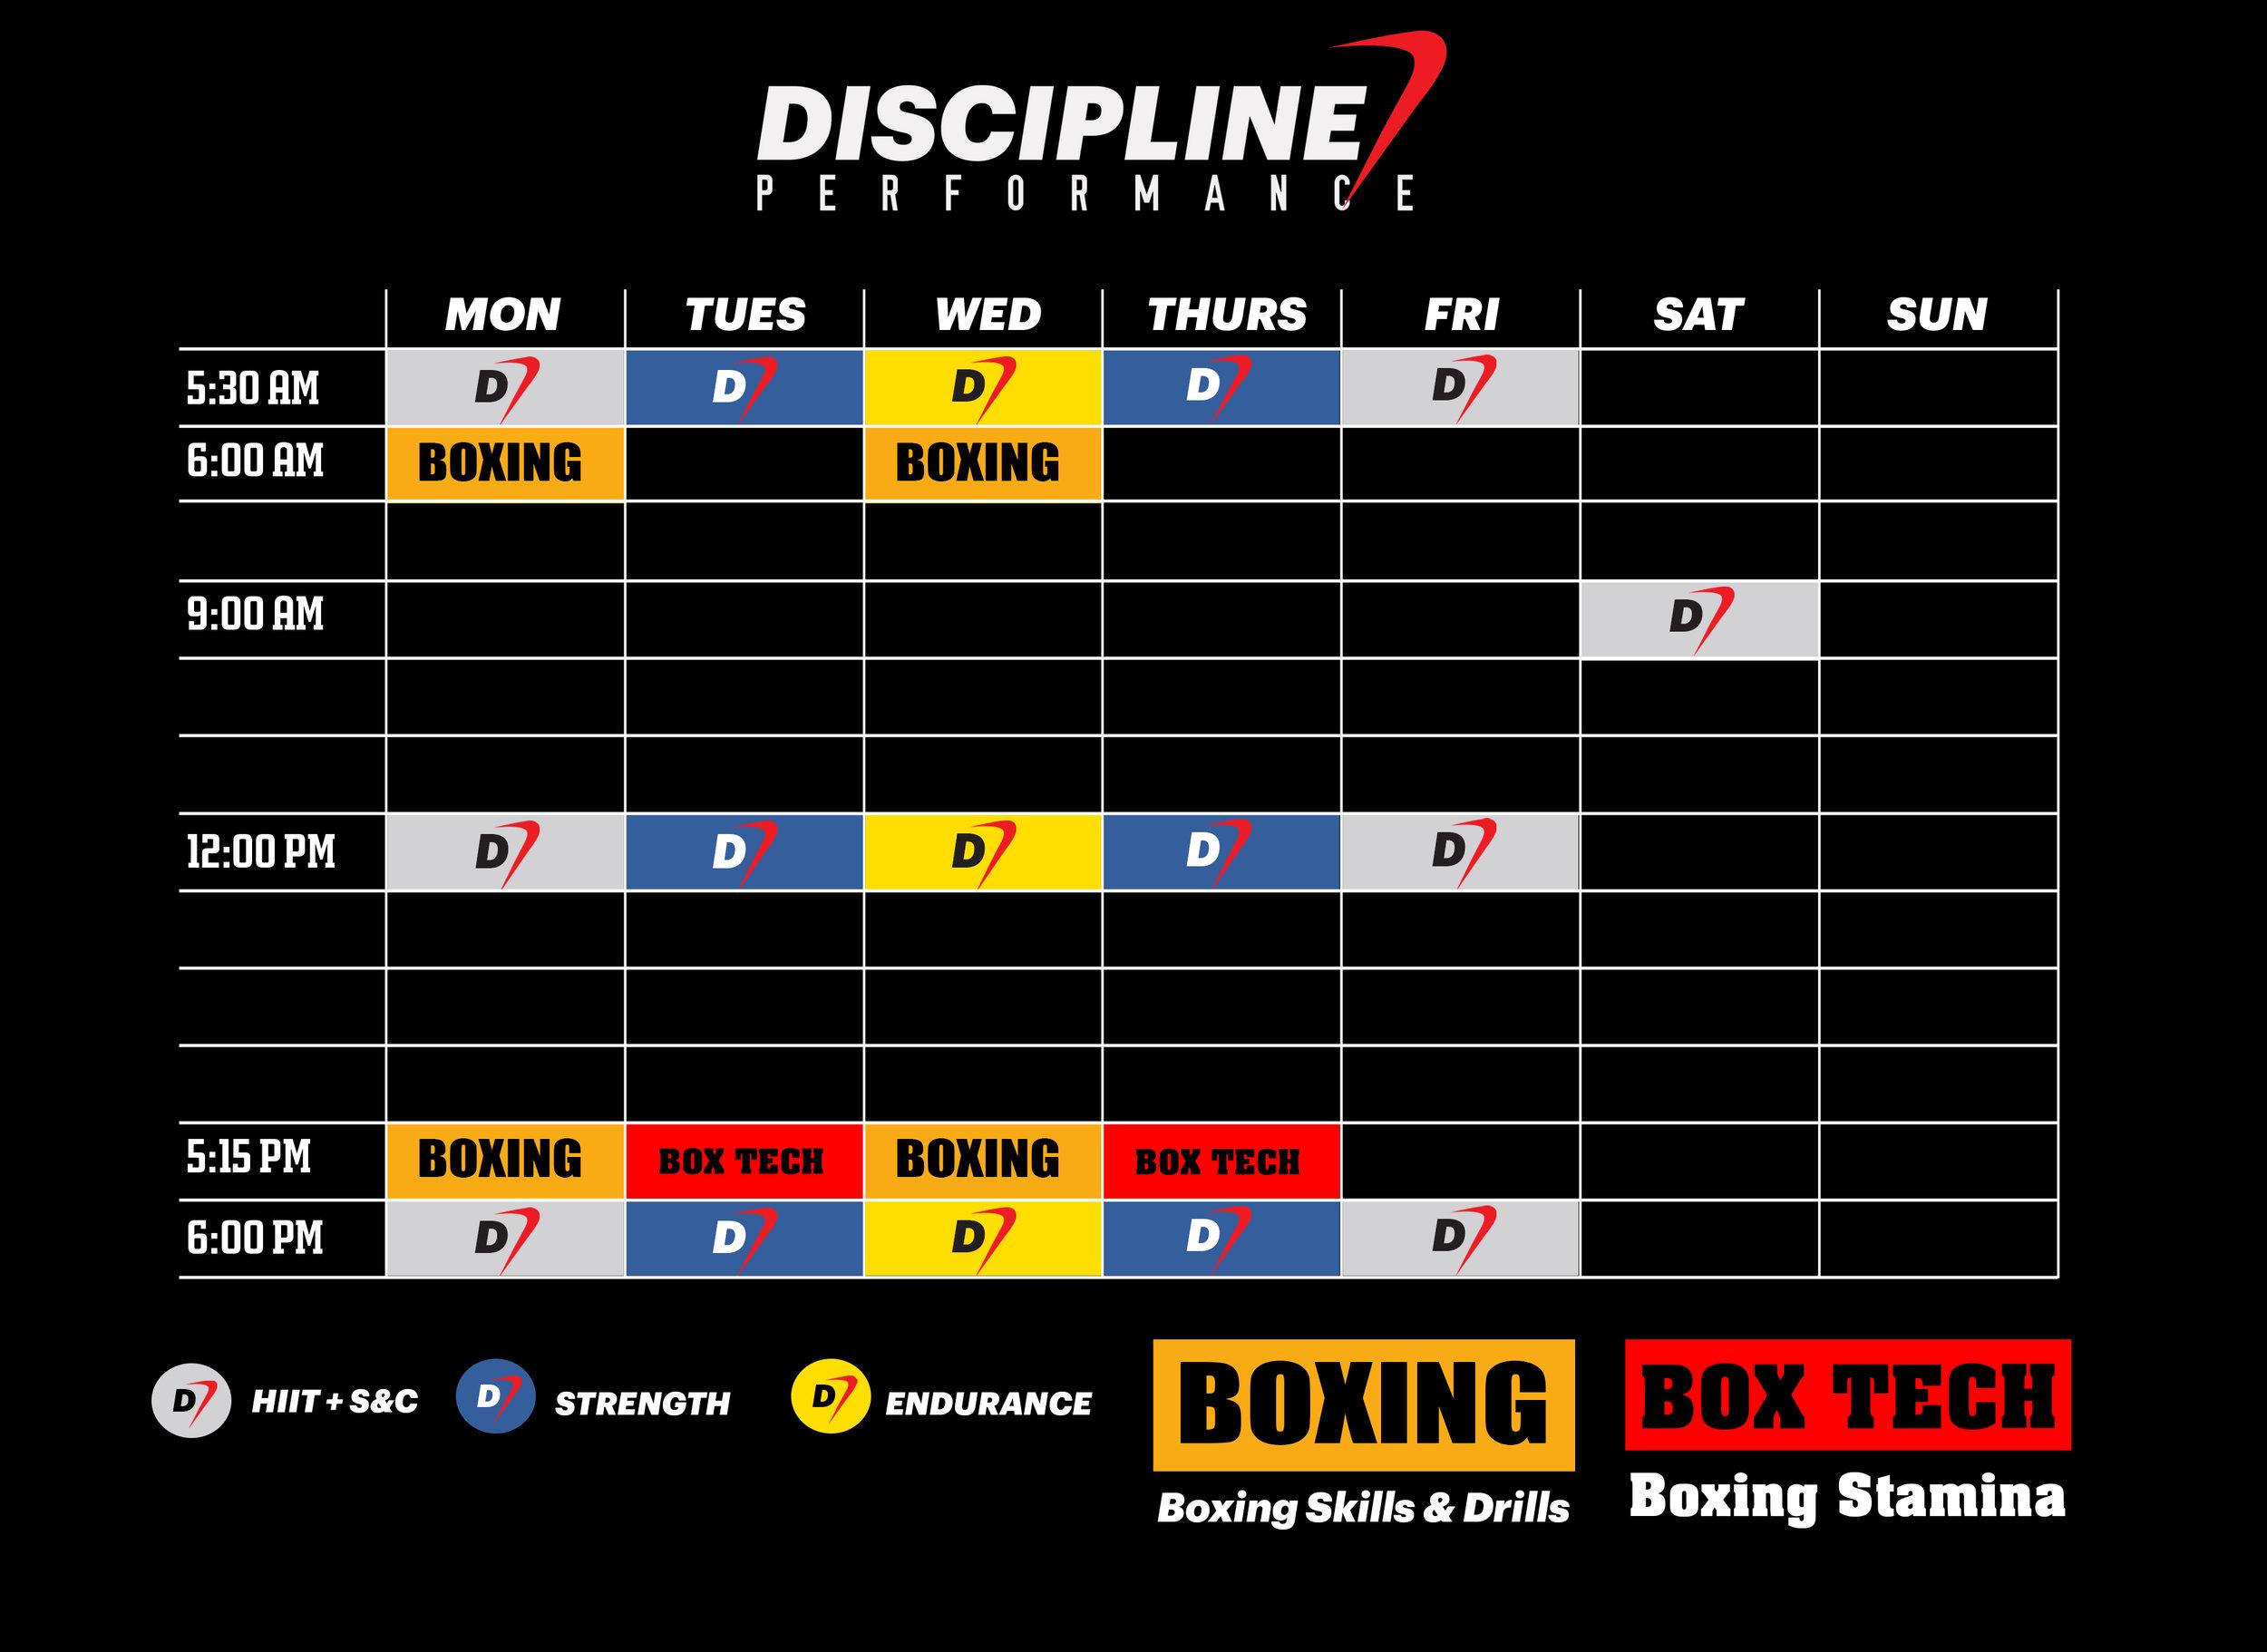 Discipline Performance